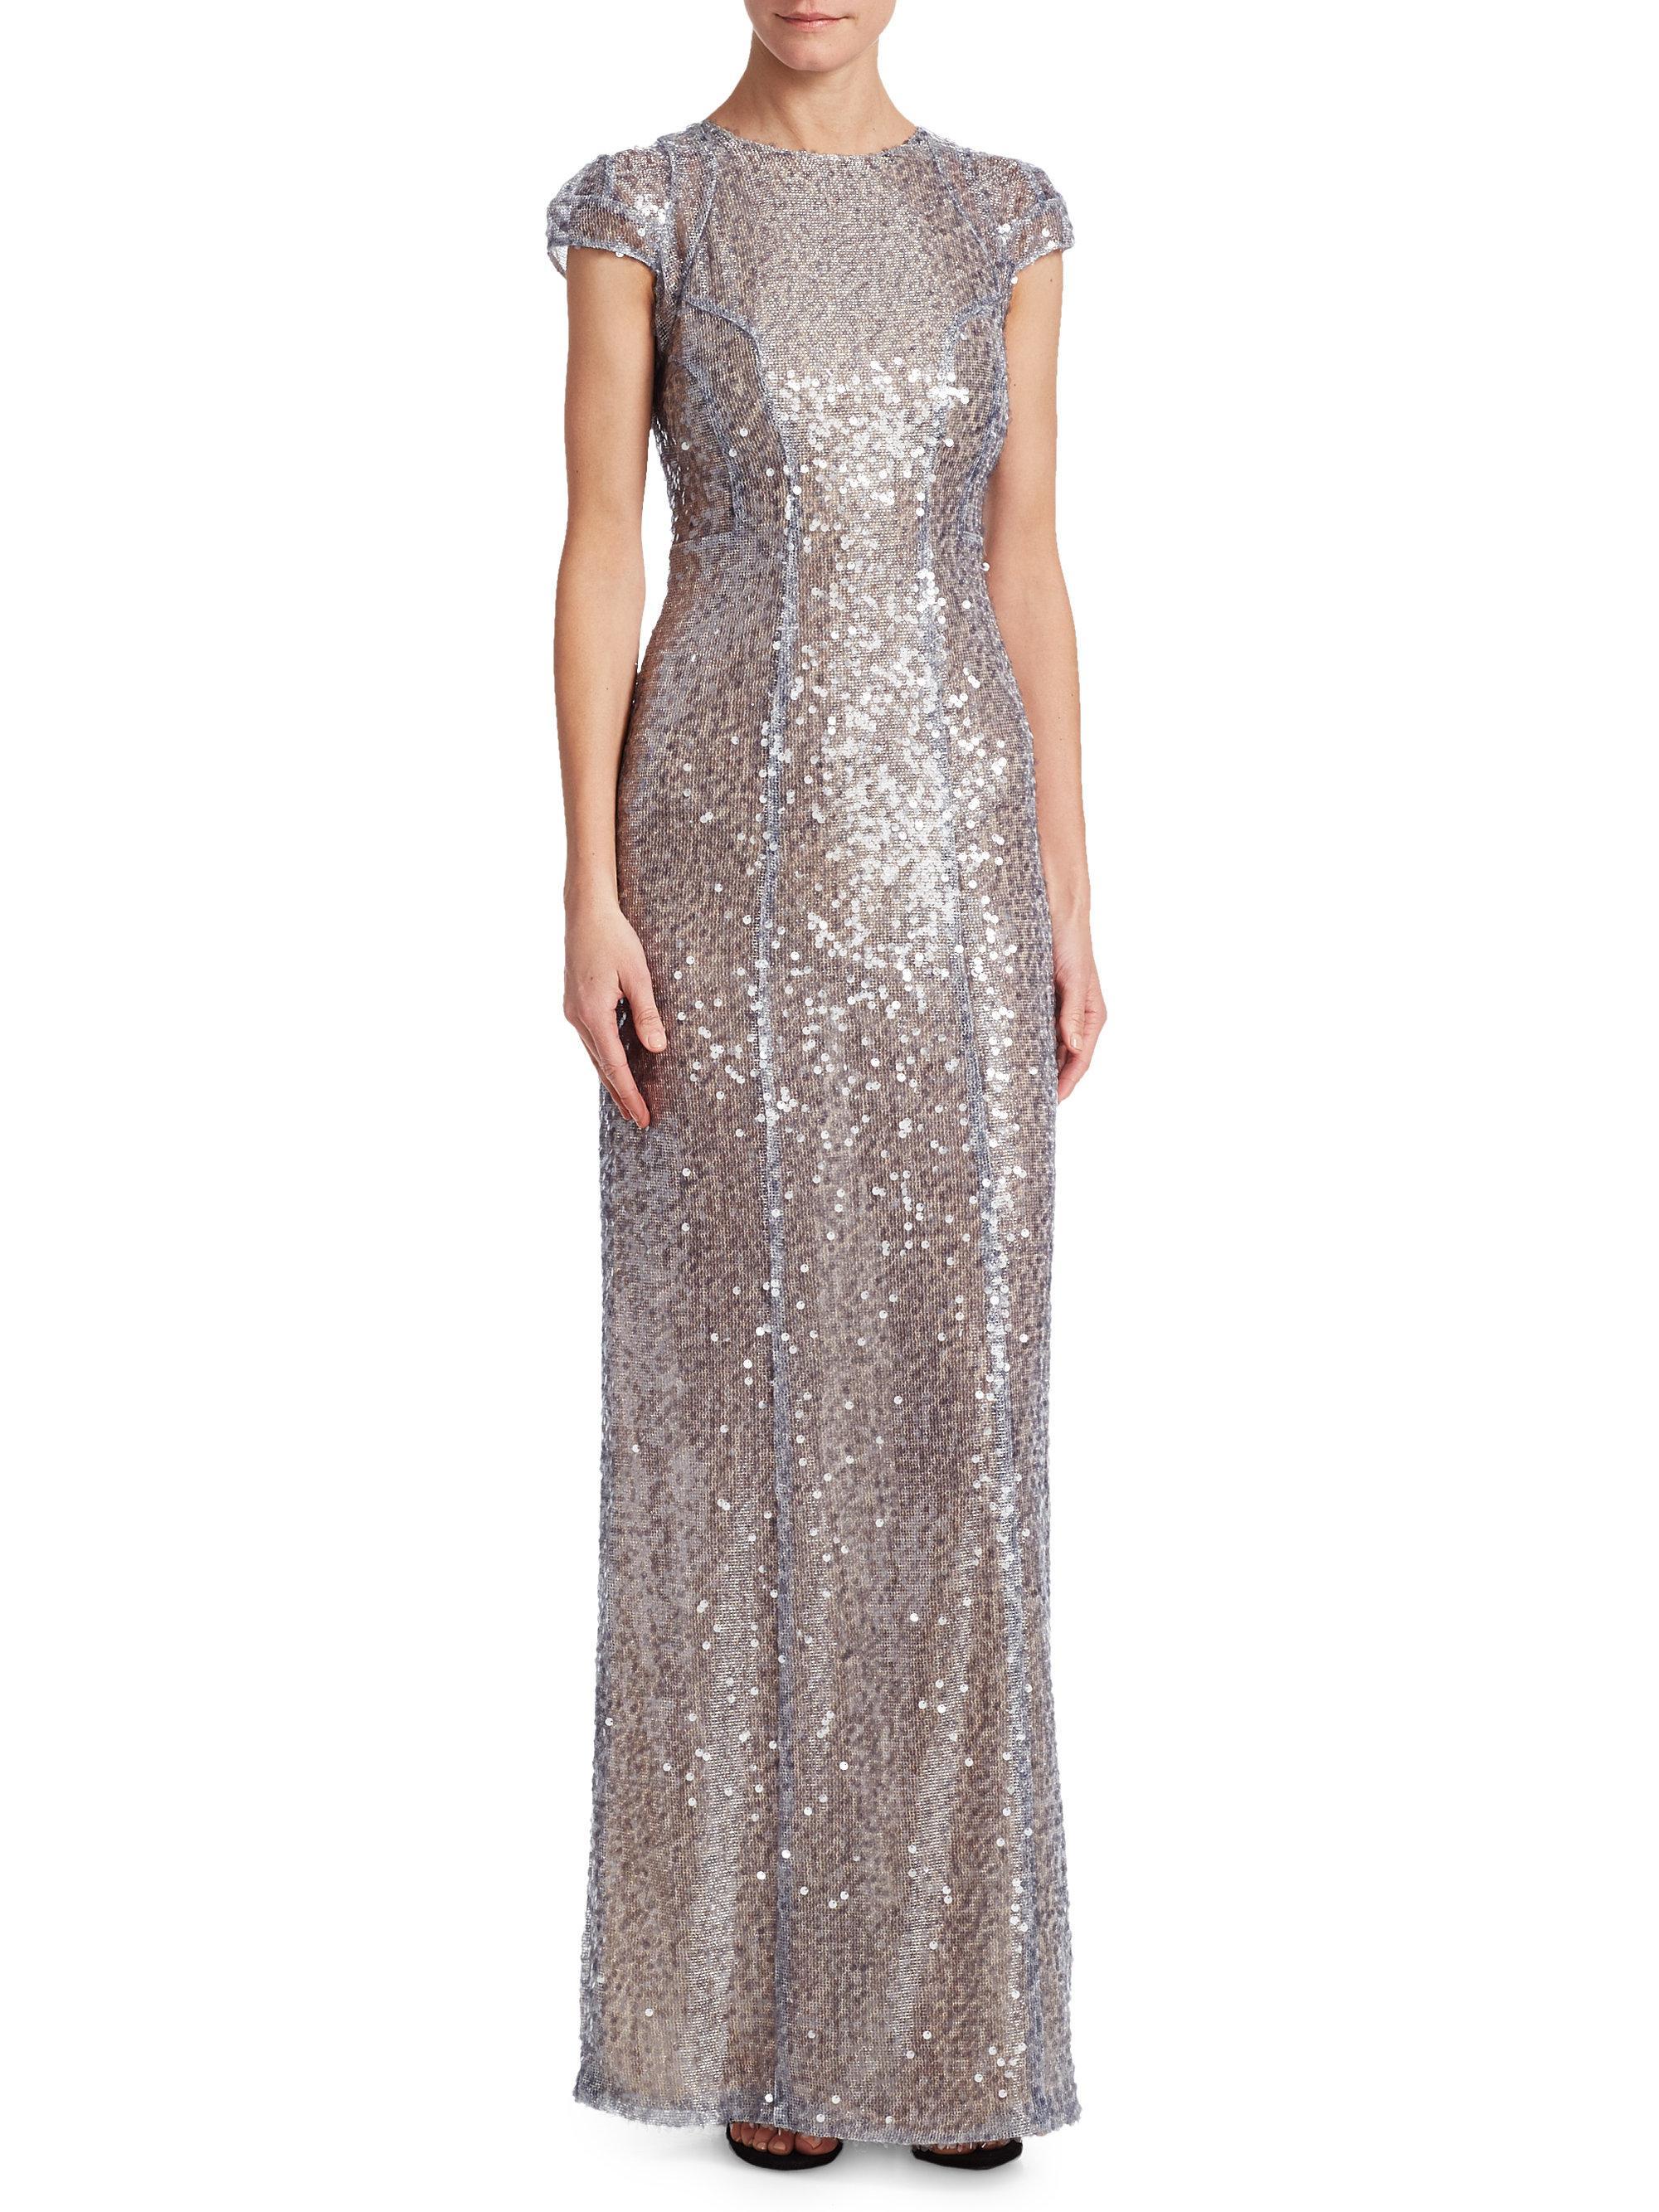 Estrella cap sleeve dress - Metallic Galvan ATiewI